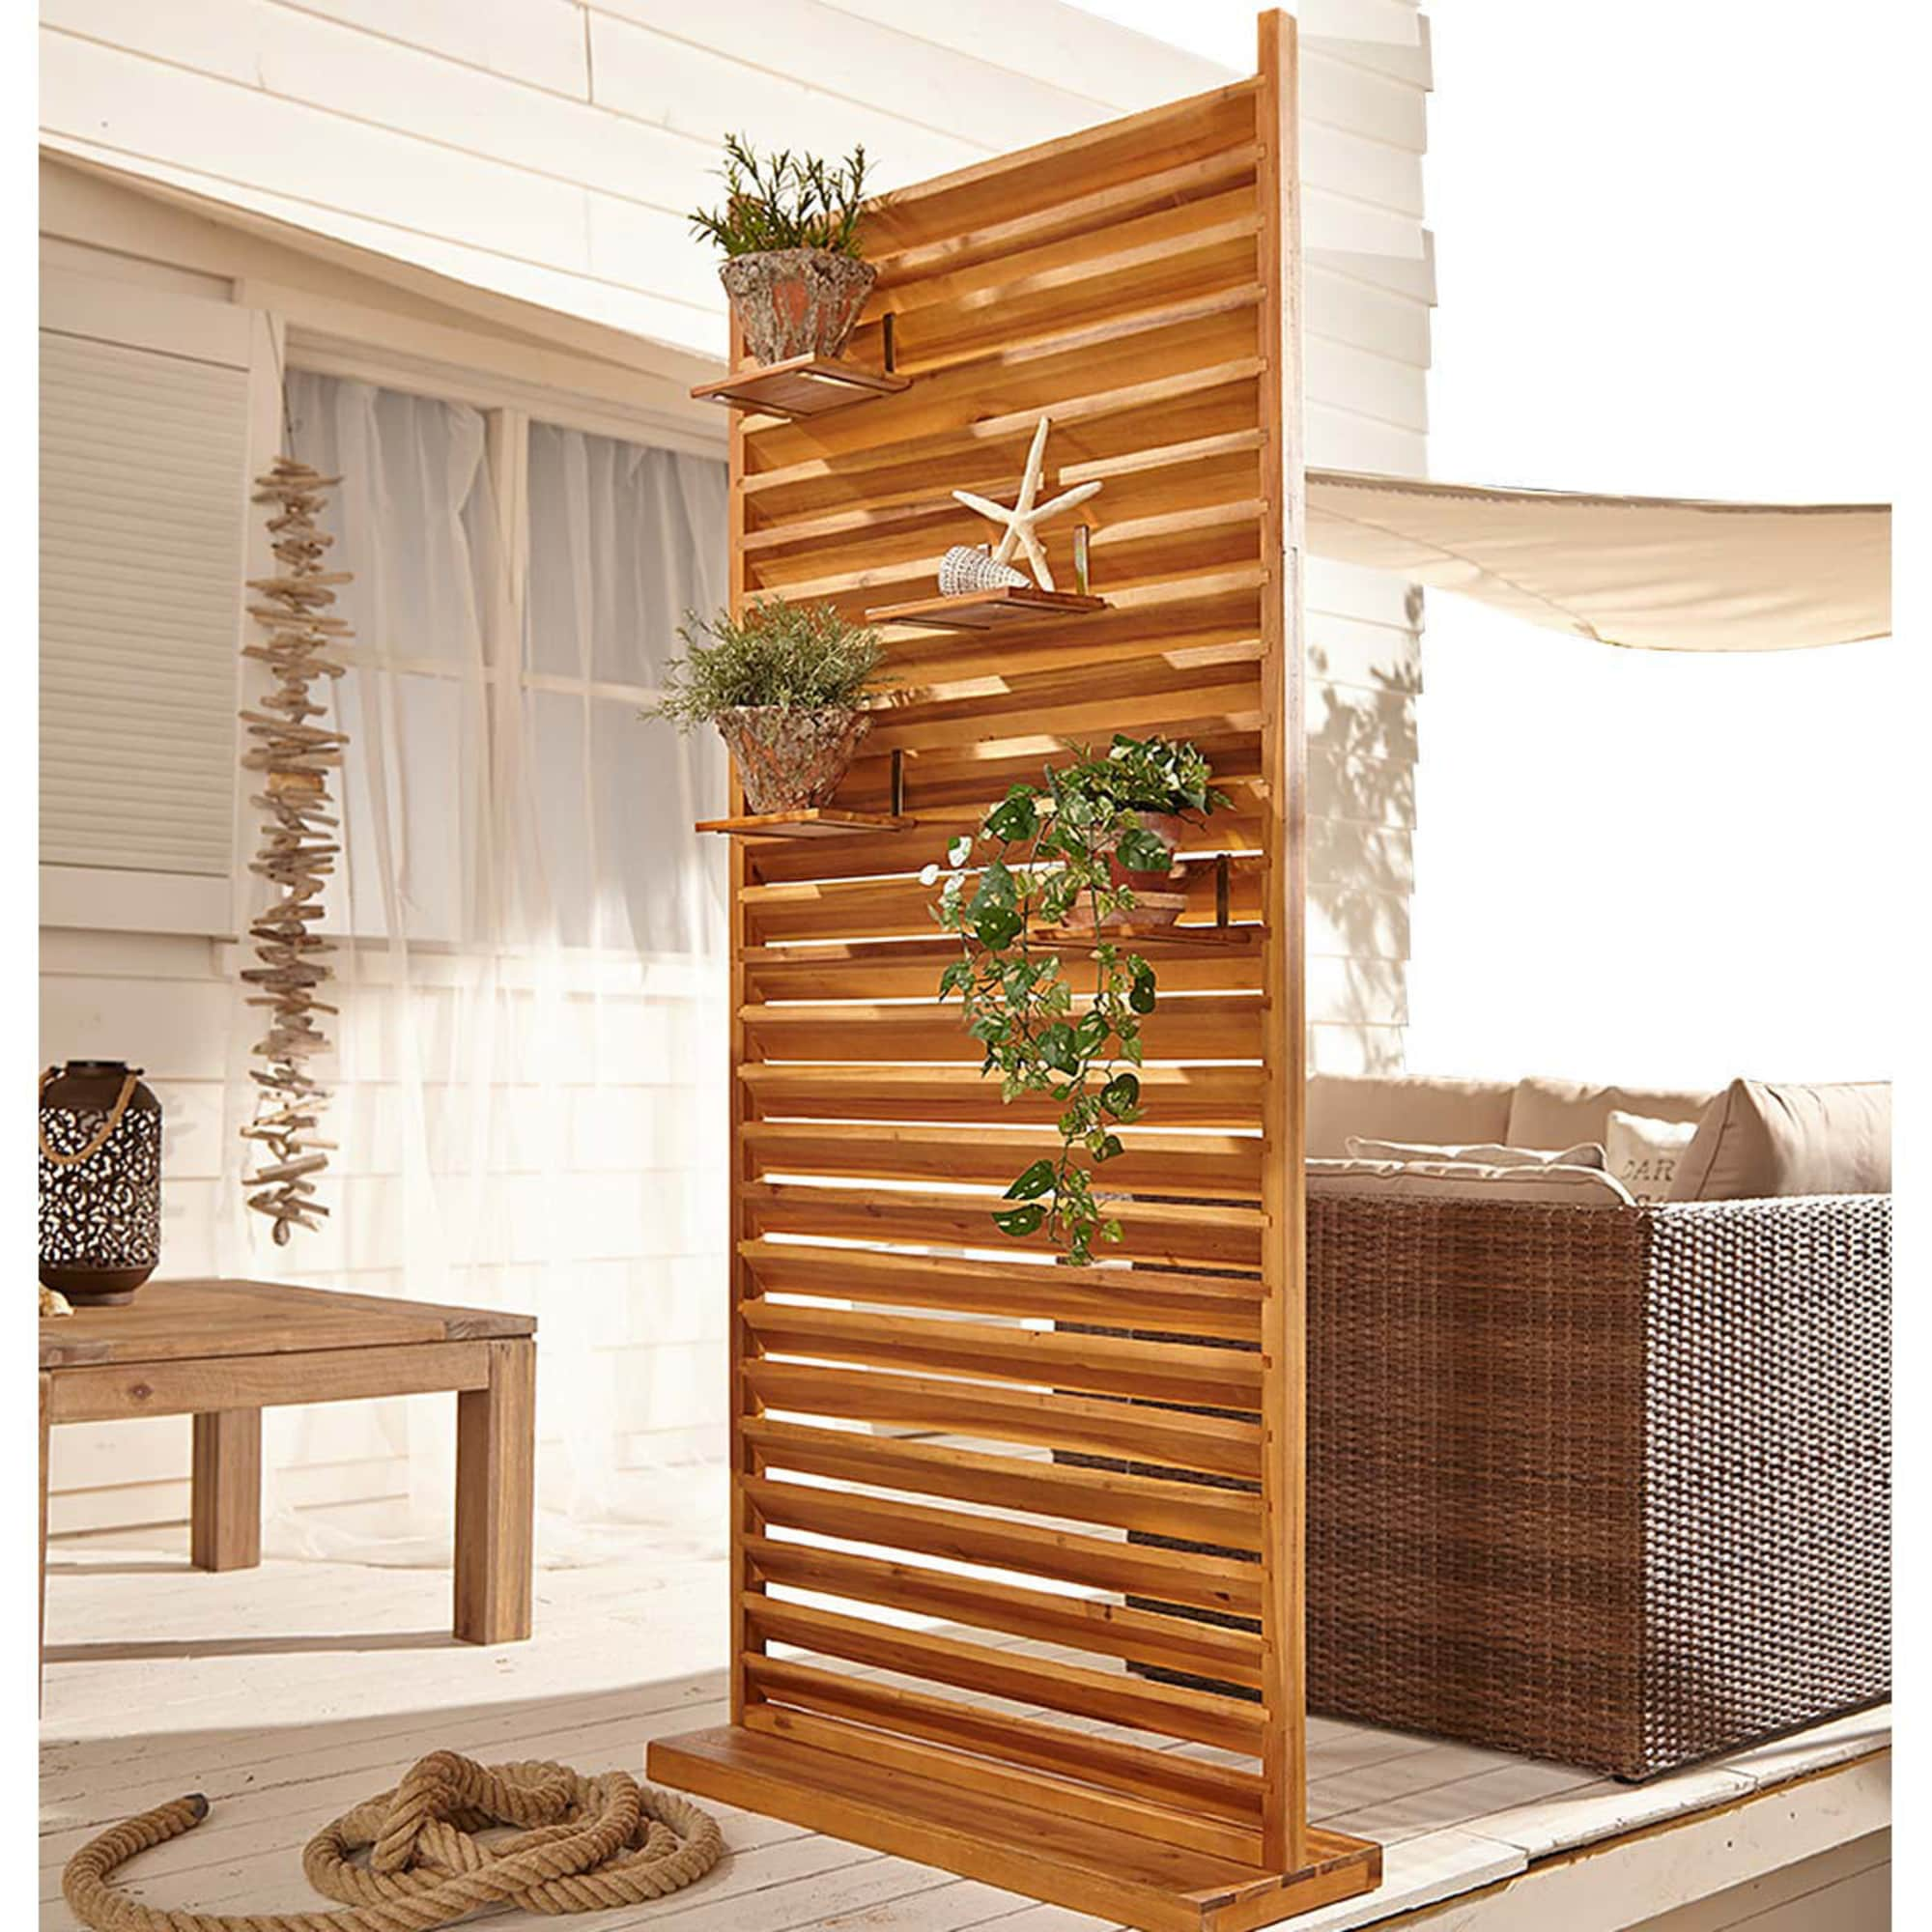 Outdoor Sichtschutz Lamellen Akazienholz